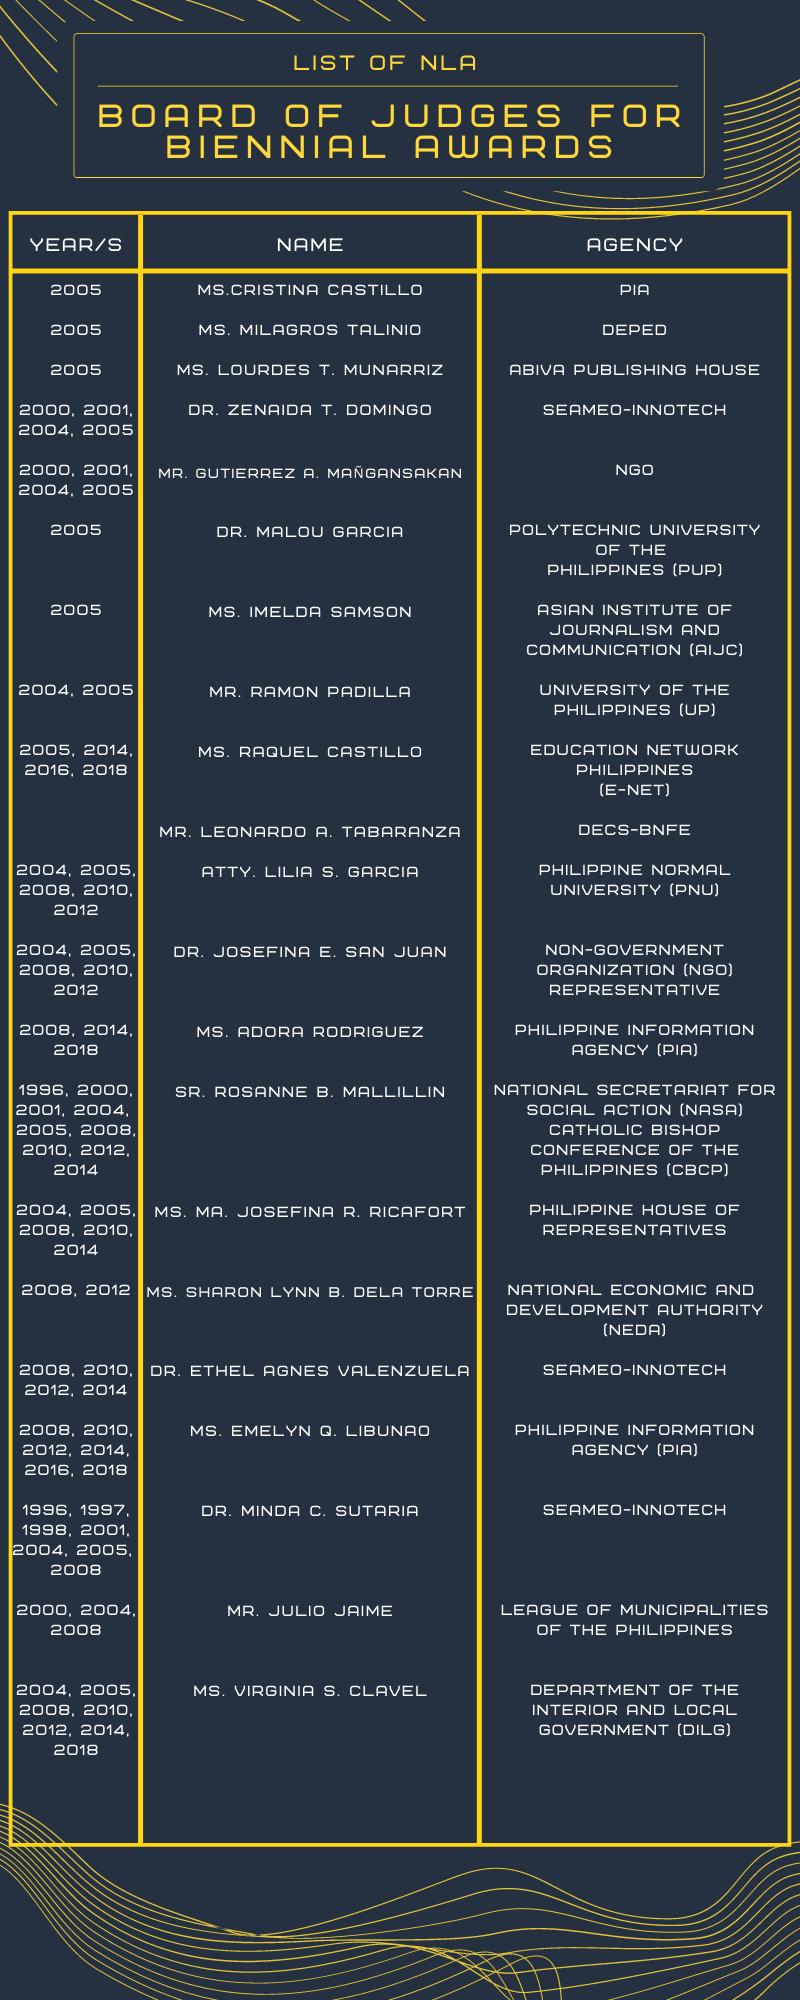 BIENNIAL AWARDS (2005-2018)